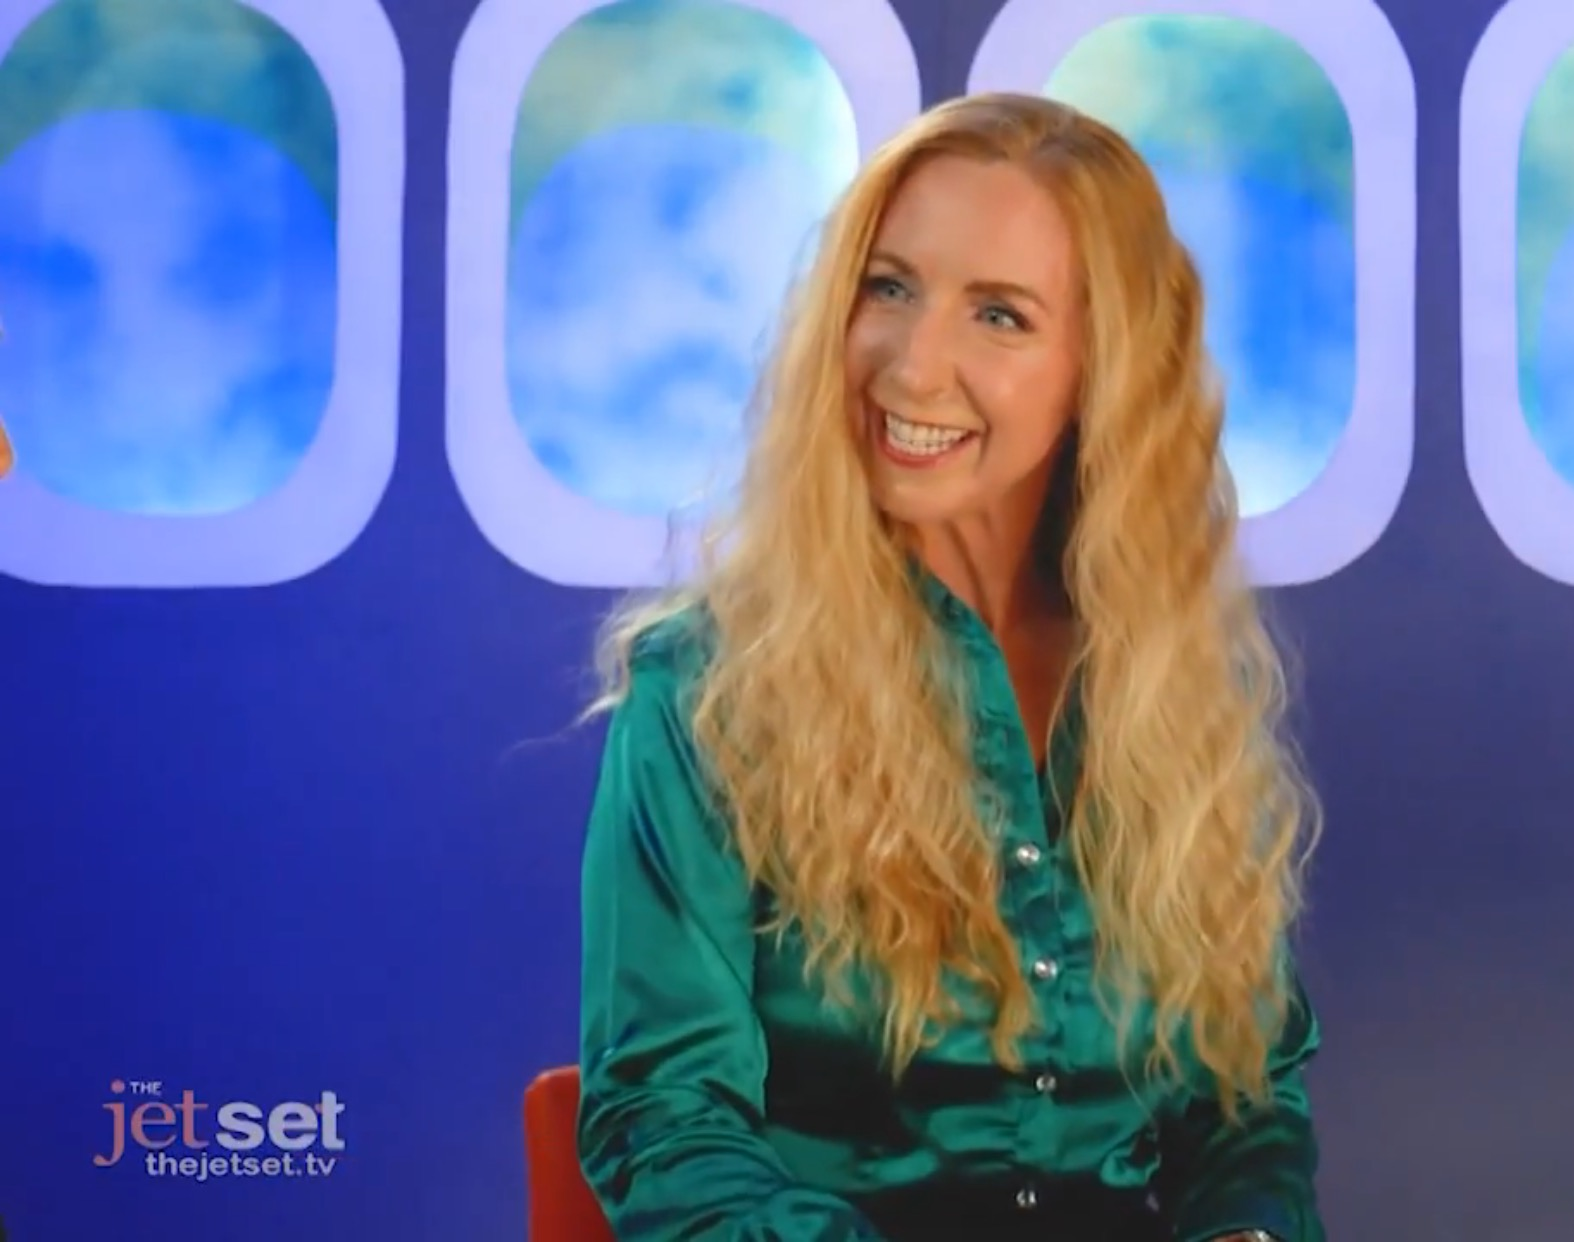 Captain Laura Helps Kick Off Season 3 of the Jet Set TV Show!